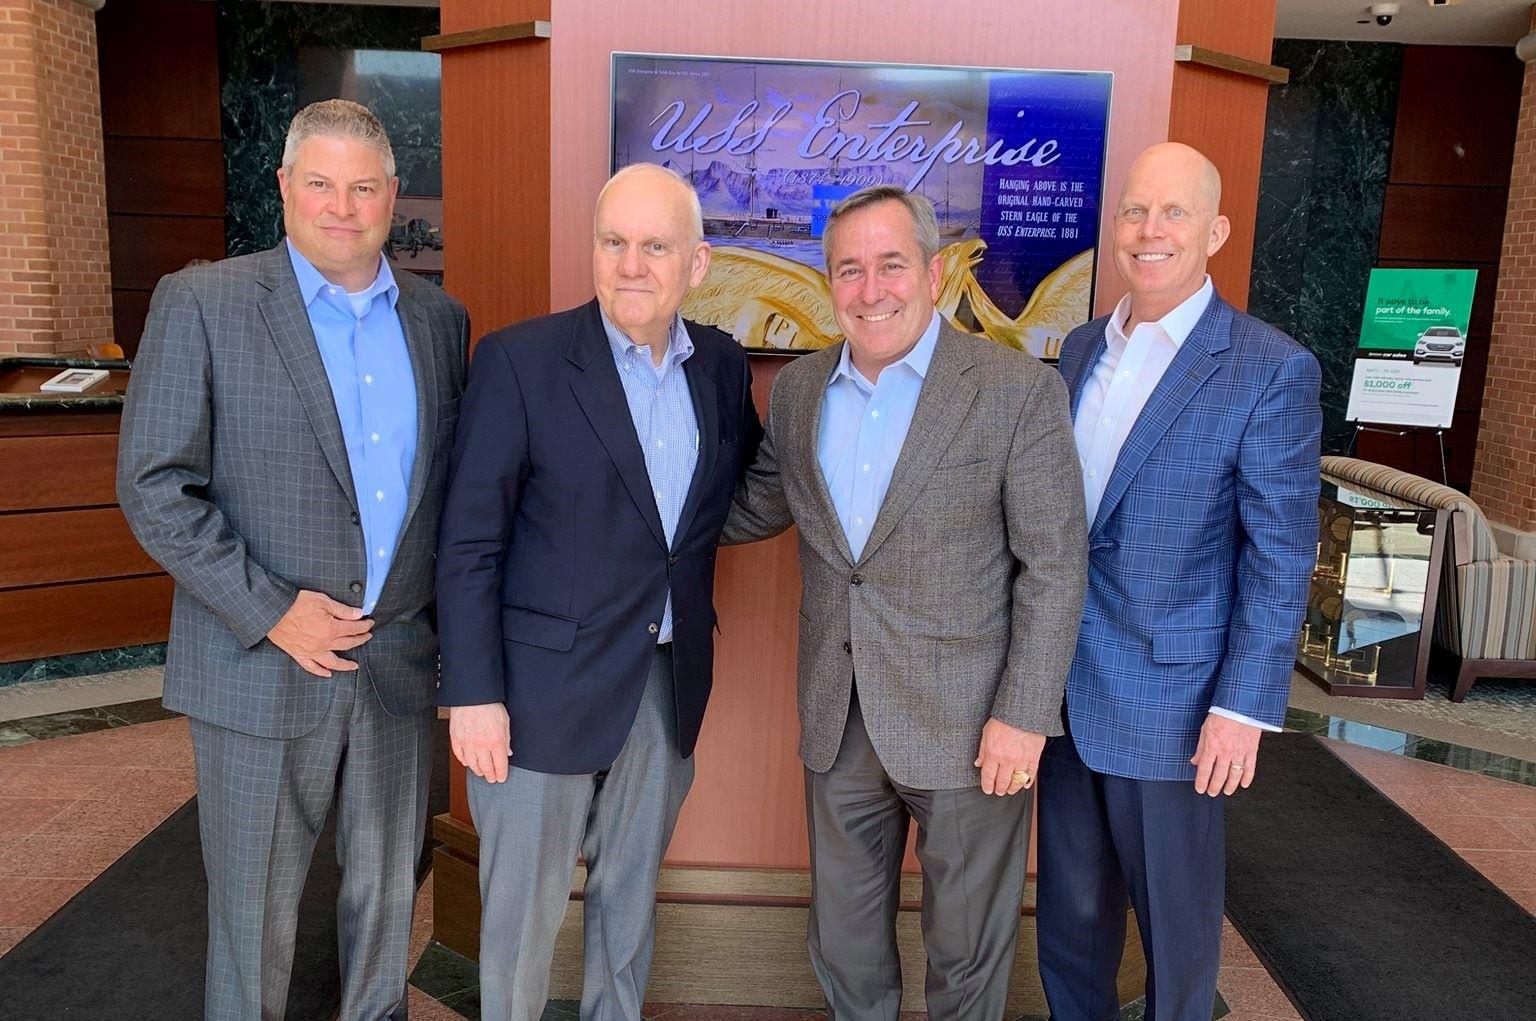 Enterprise leadership team